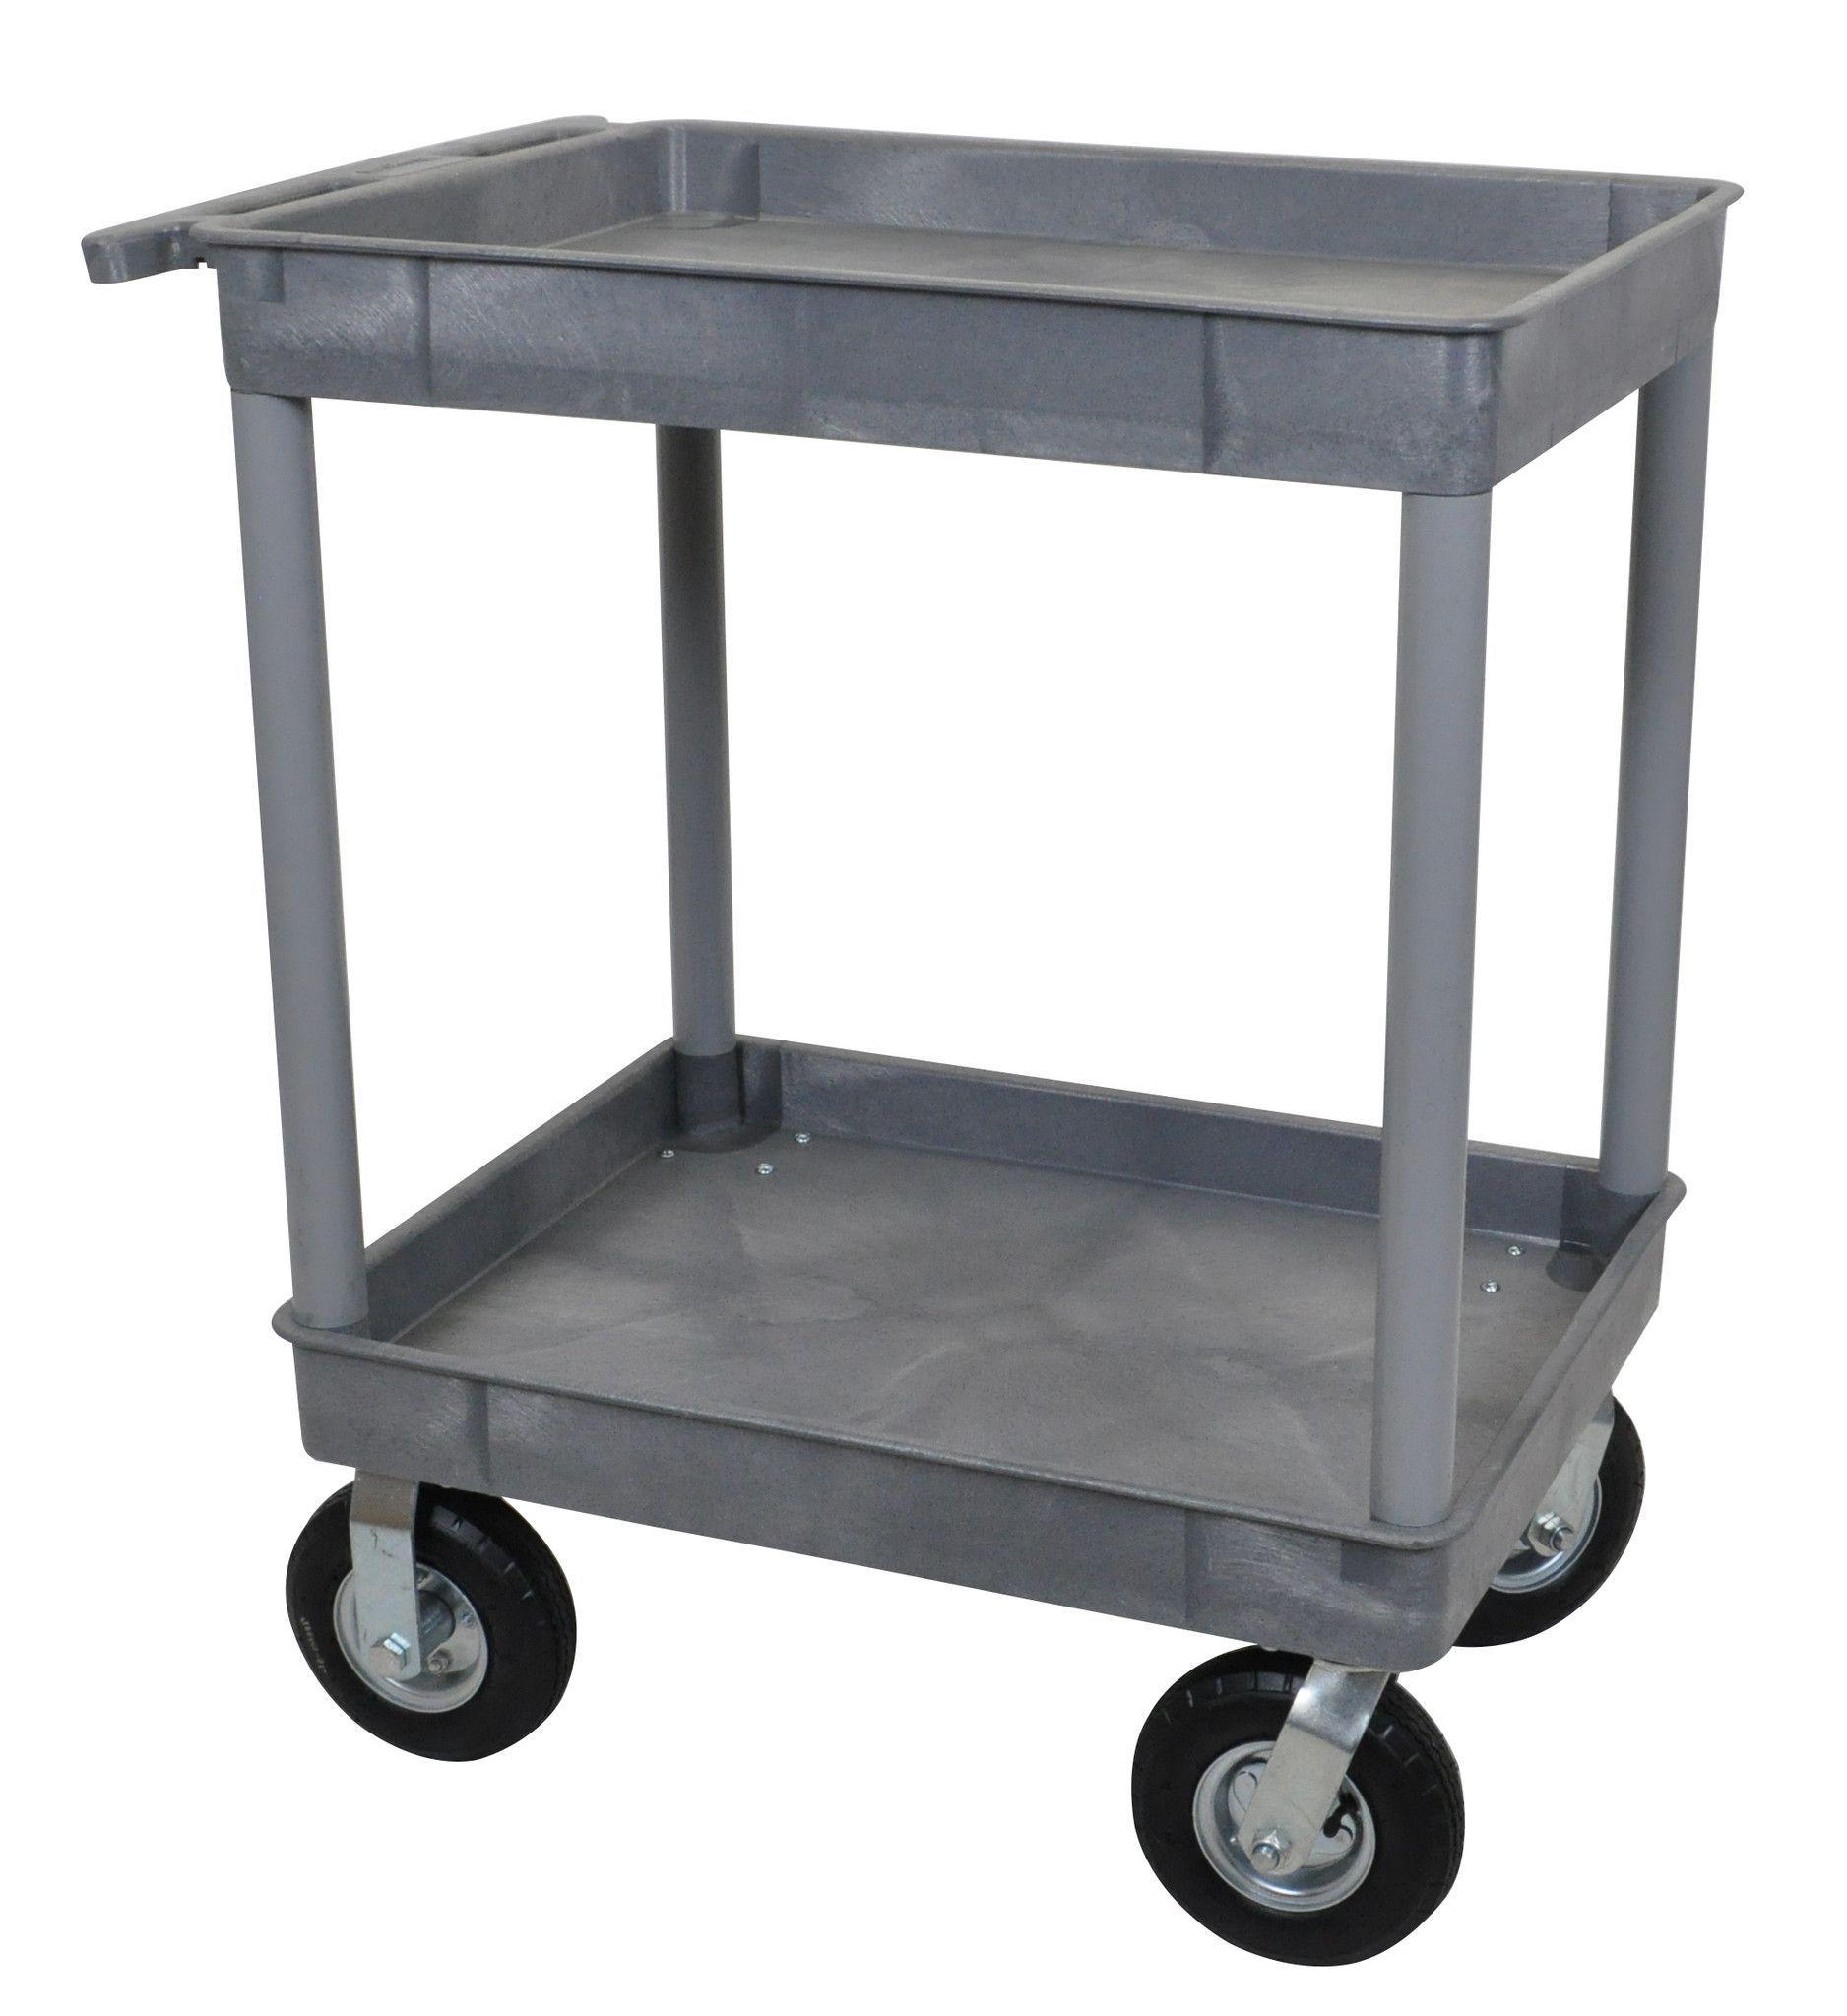 Gray 24x32 2 Tub Cart W/ P8 Casters